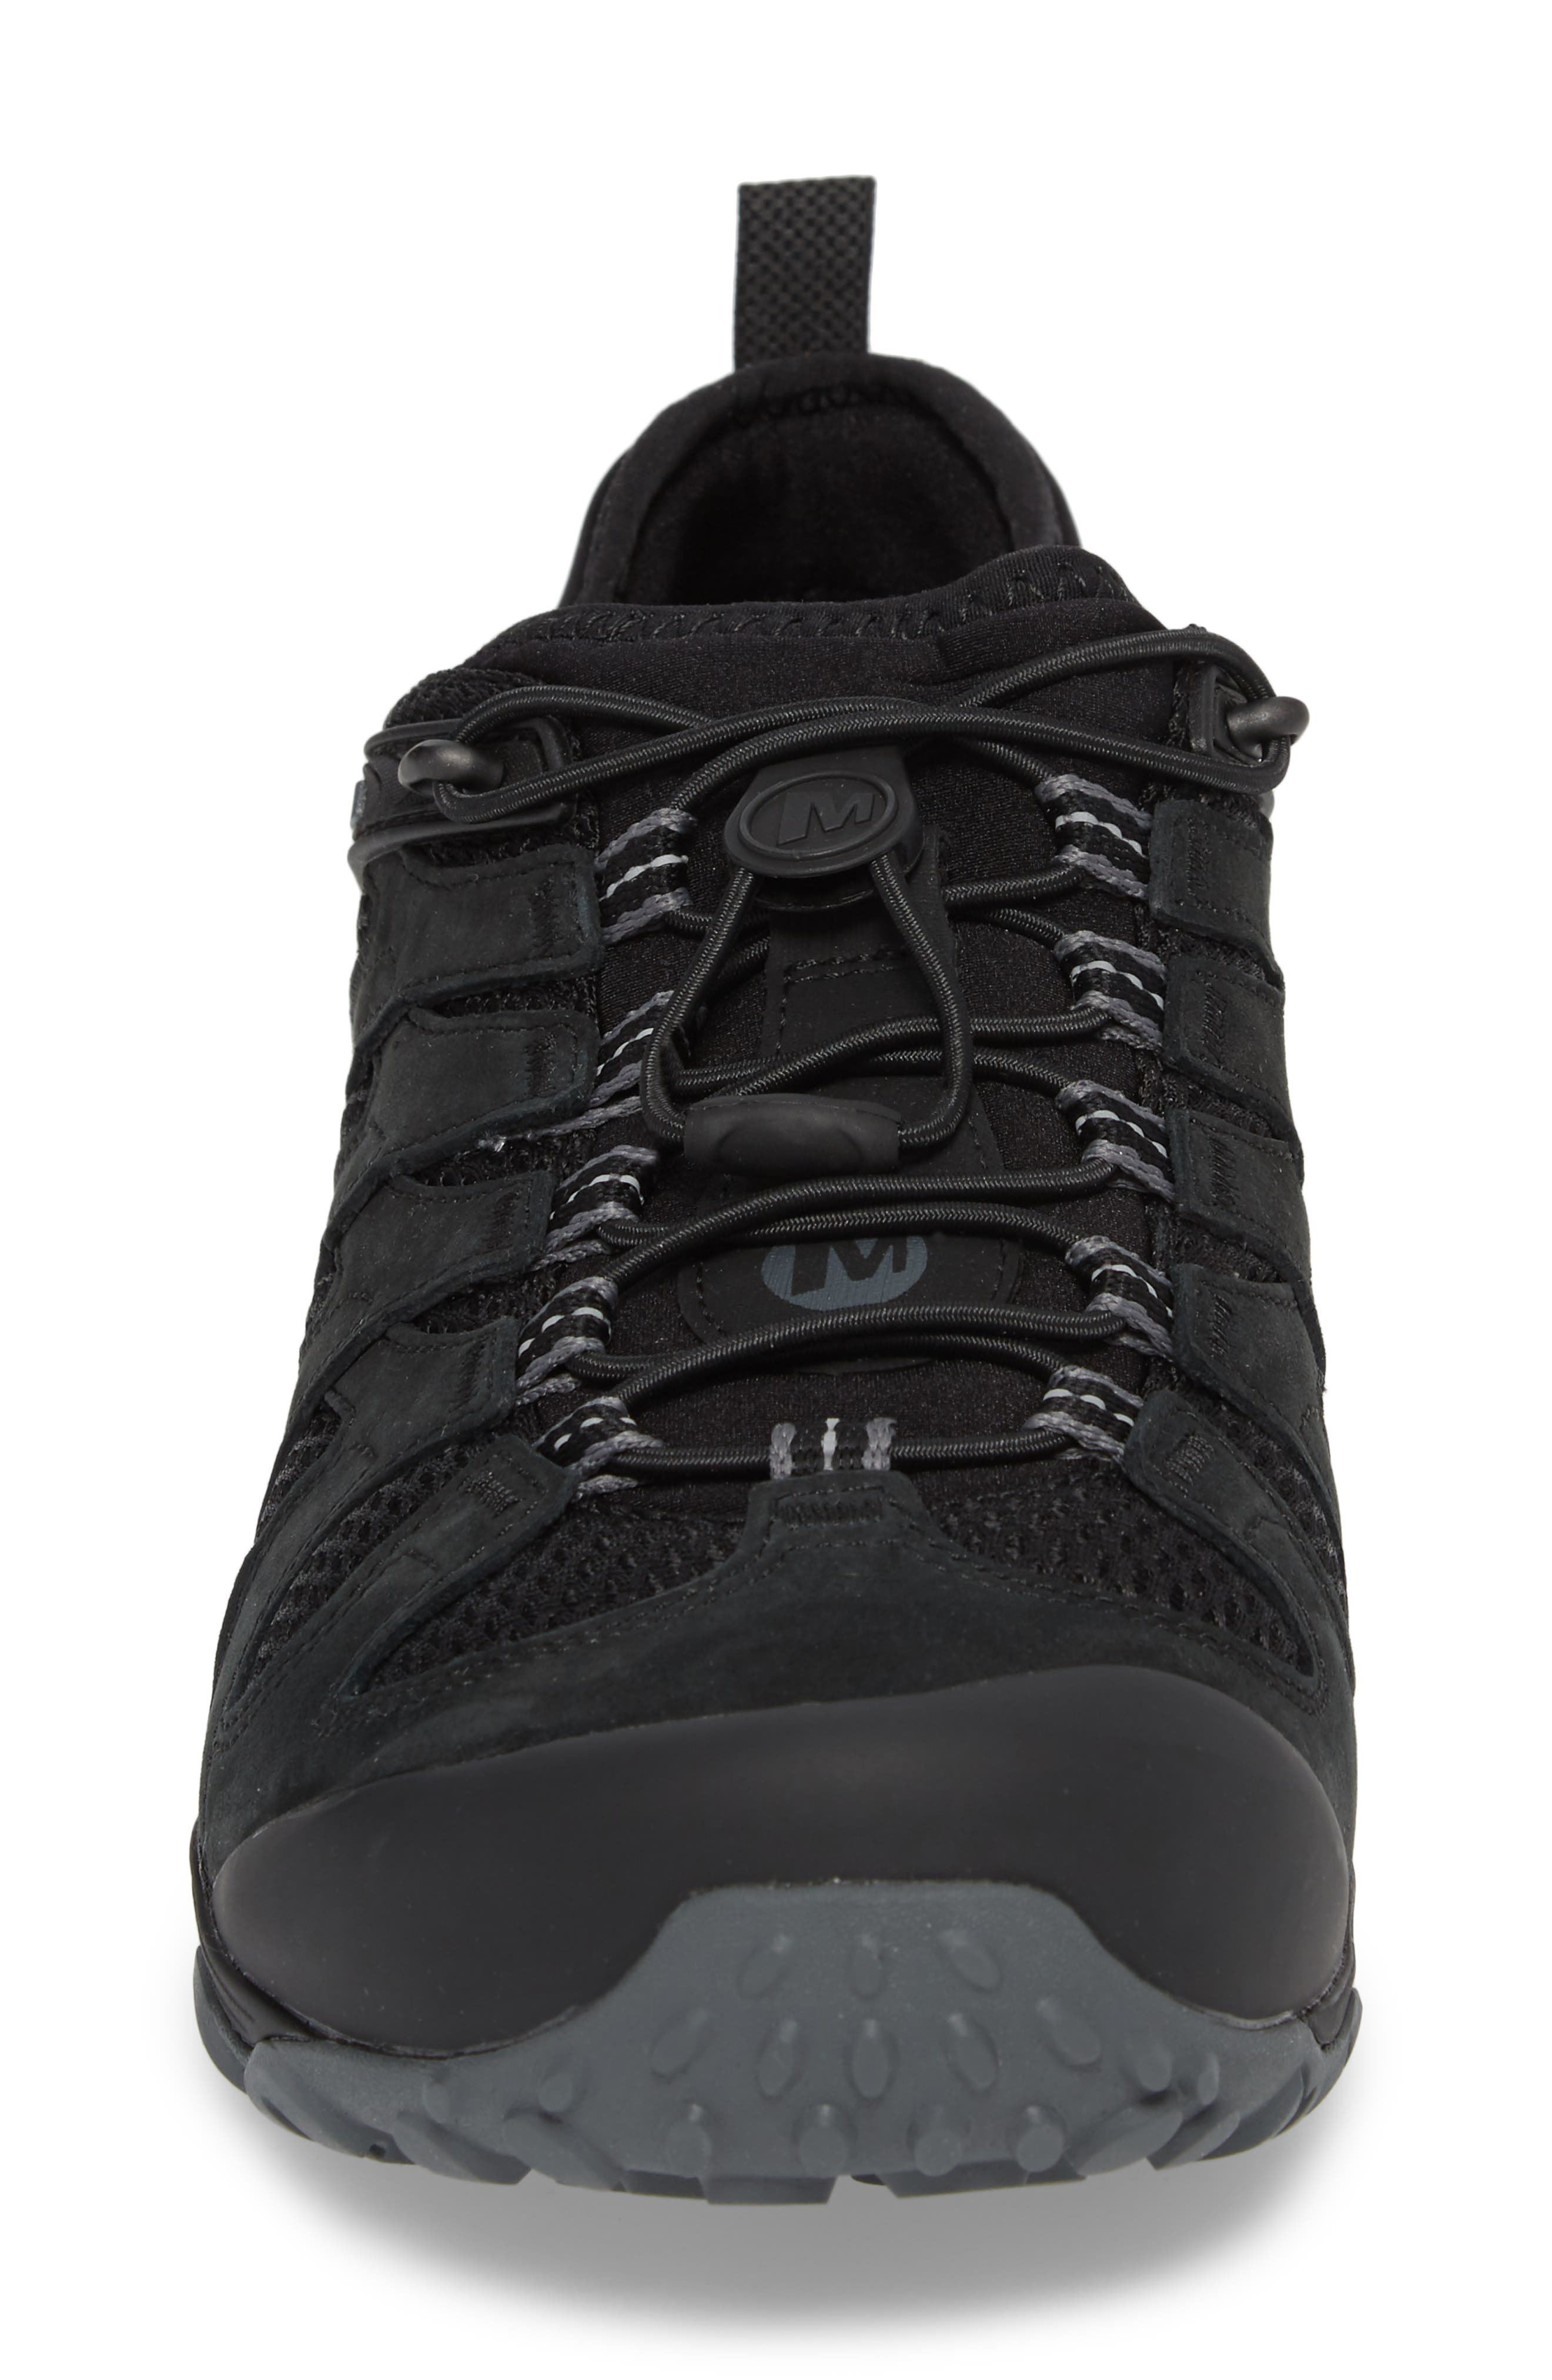 MERRELL, Chameleon 7 Stretch Hiking Shoe, Alternate thumbnail 4, color, BLACK